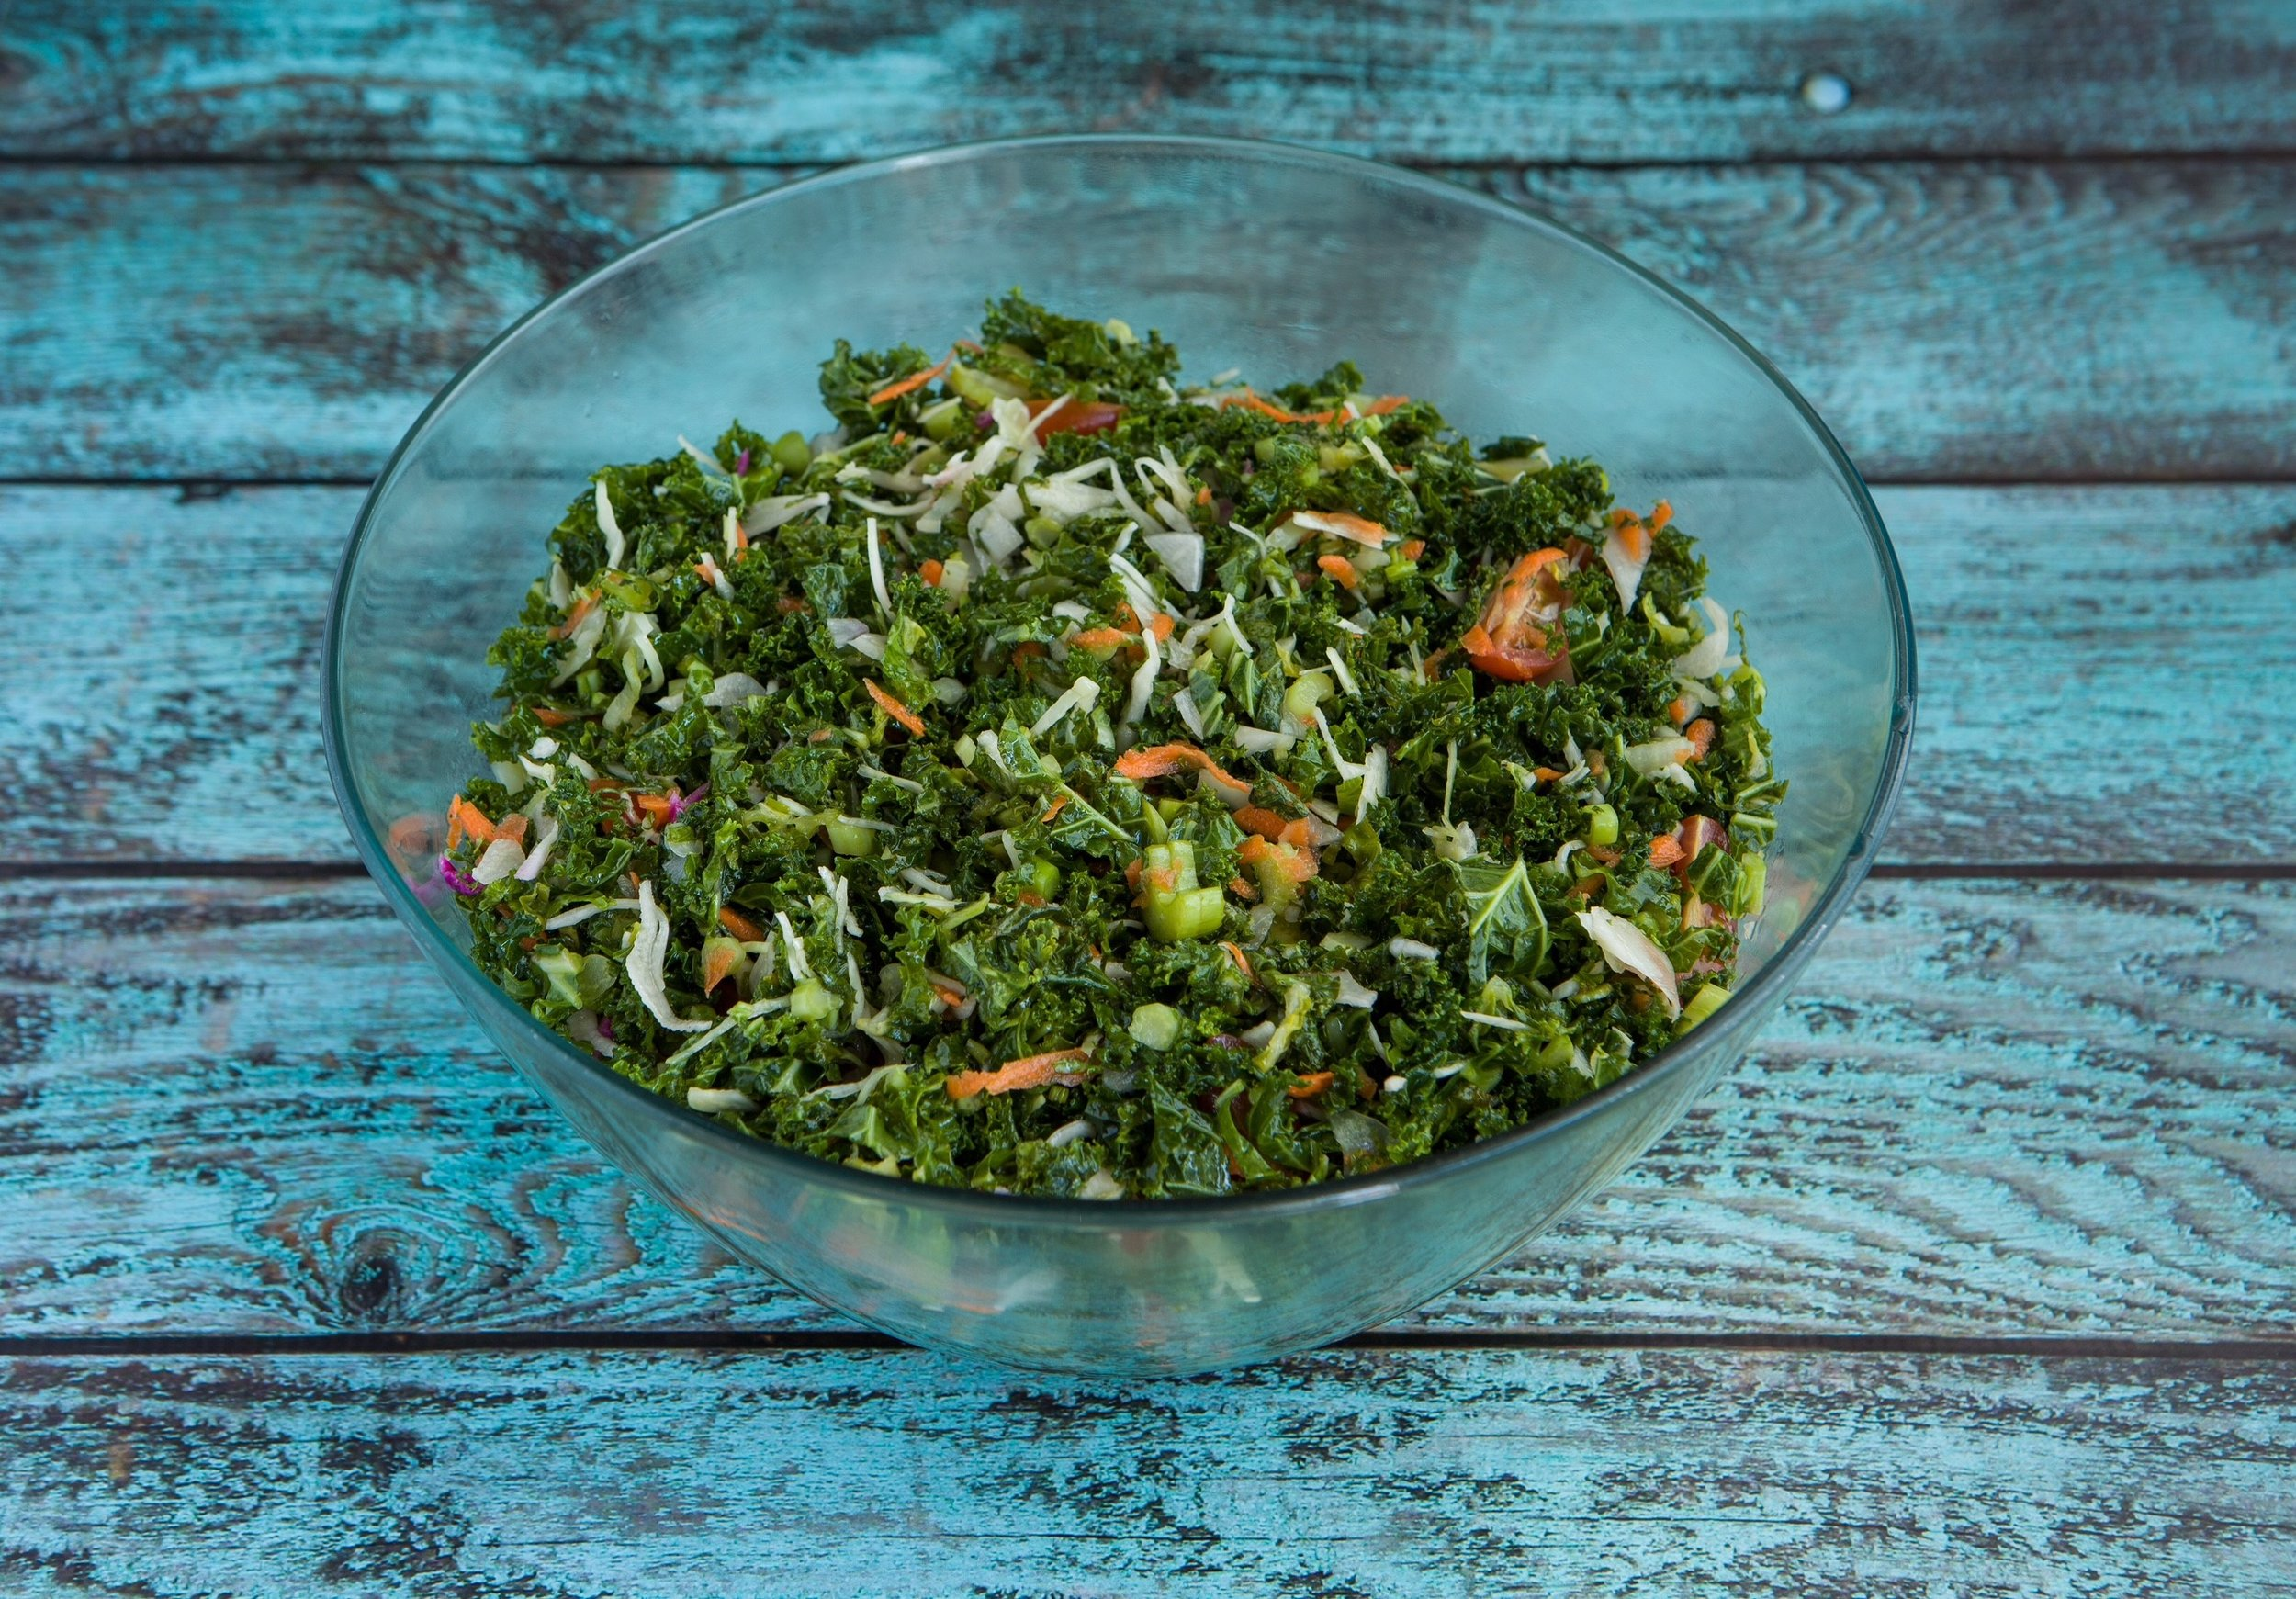 Kale Salad $4.95